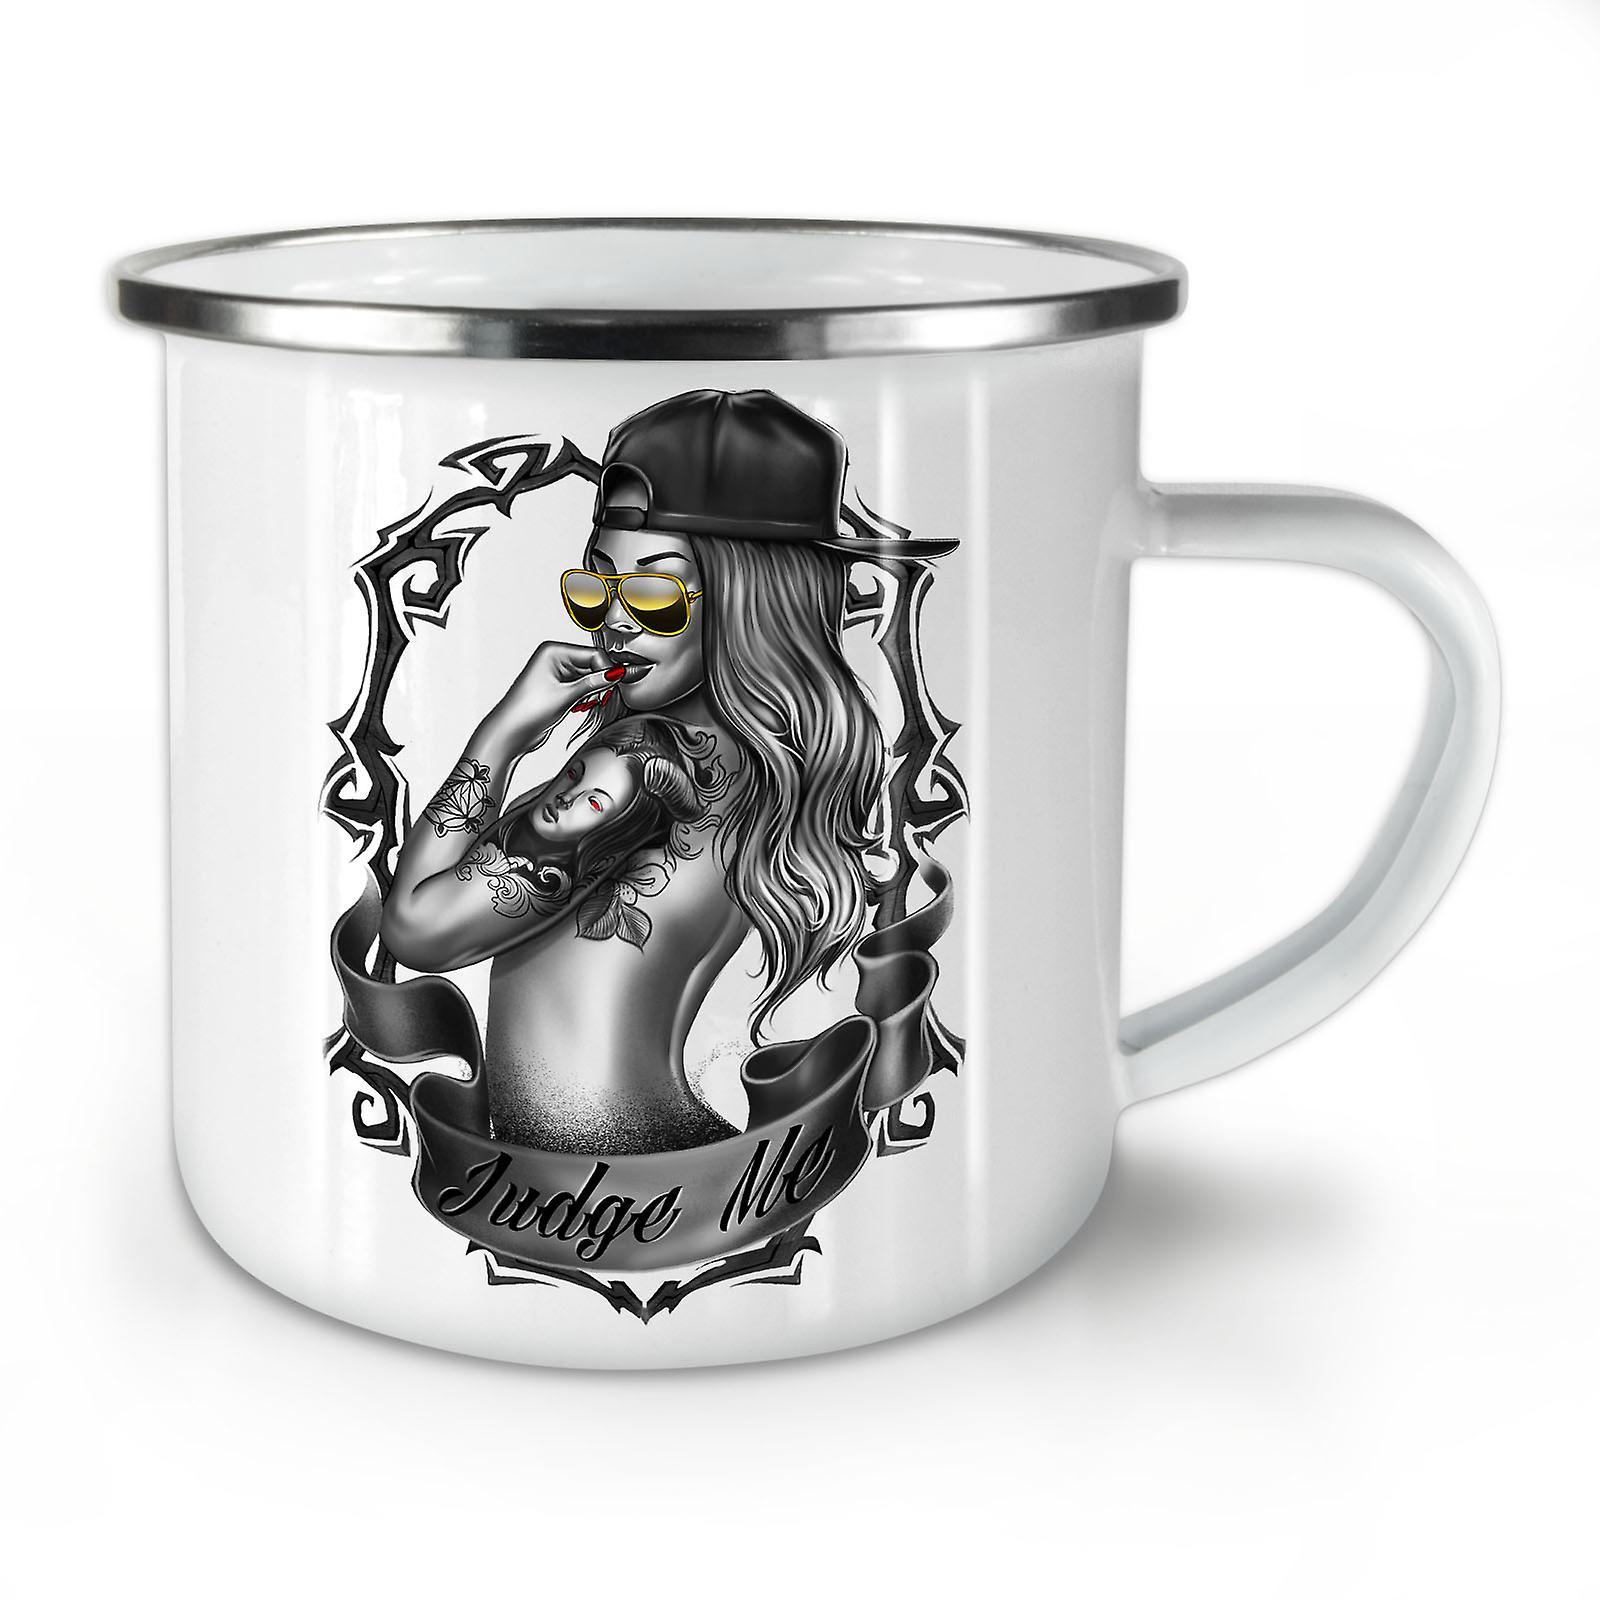 Hot Juge Me OzWellcoda Nouvelle Girl Mug10 Fashion Café Émail Whitetea If7mY6yvbg